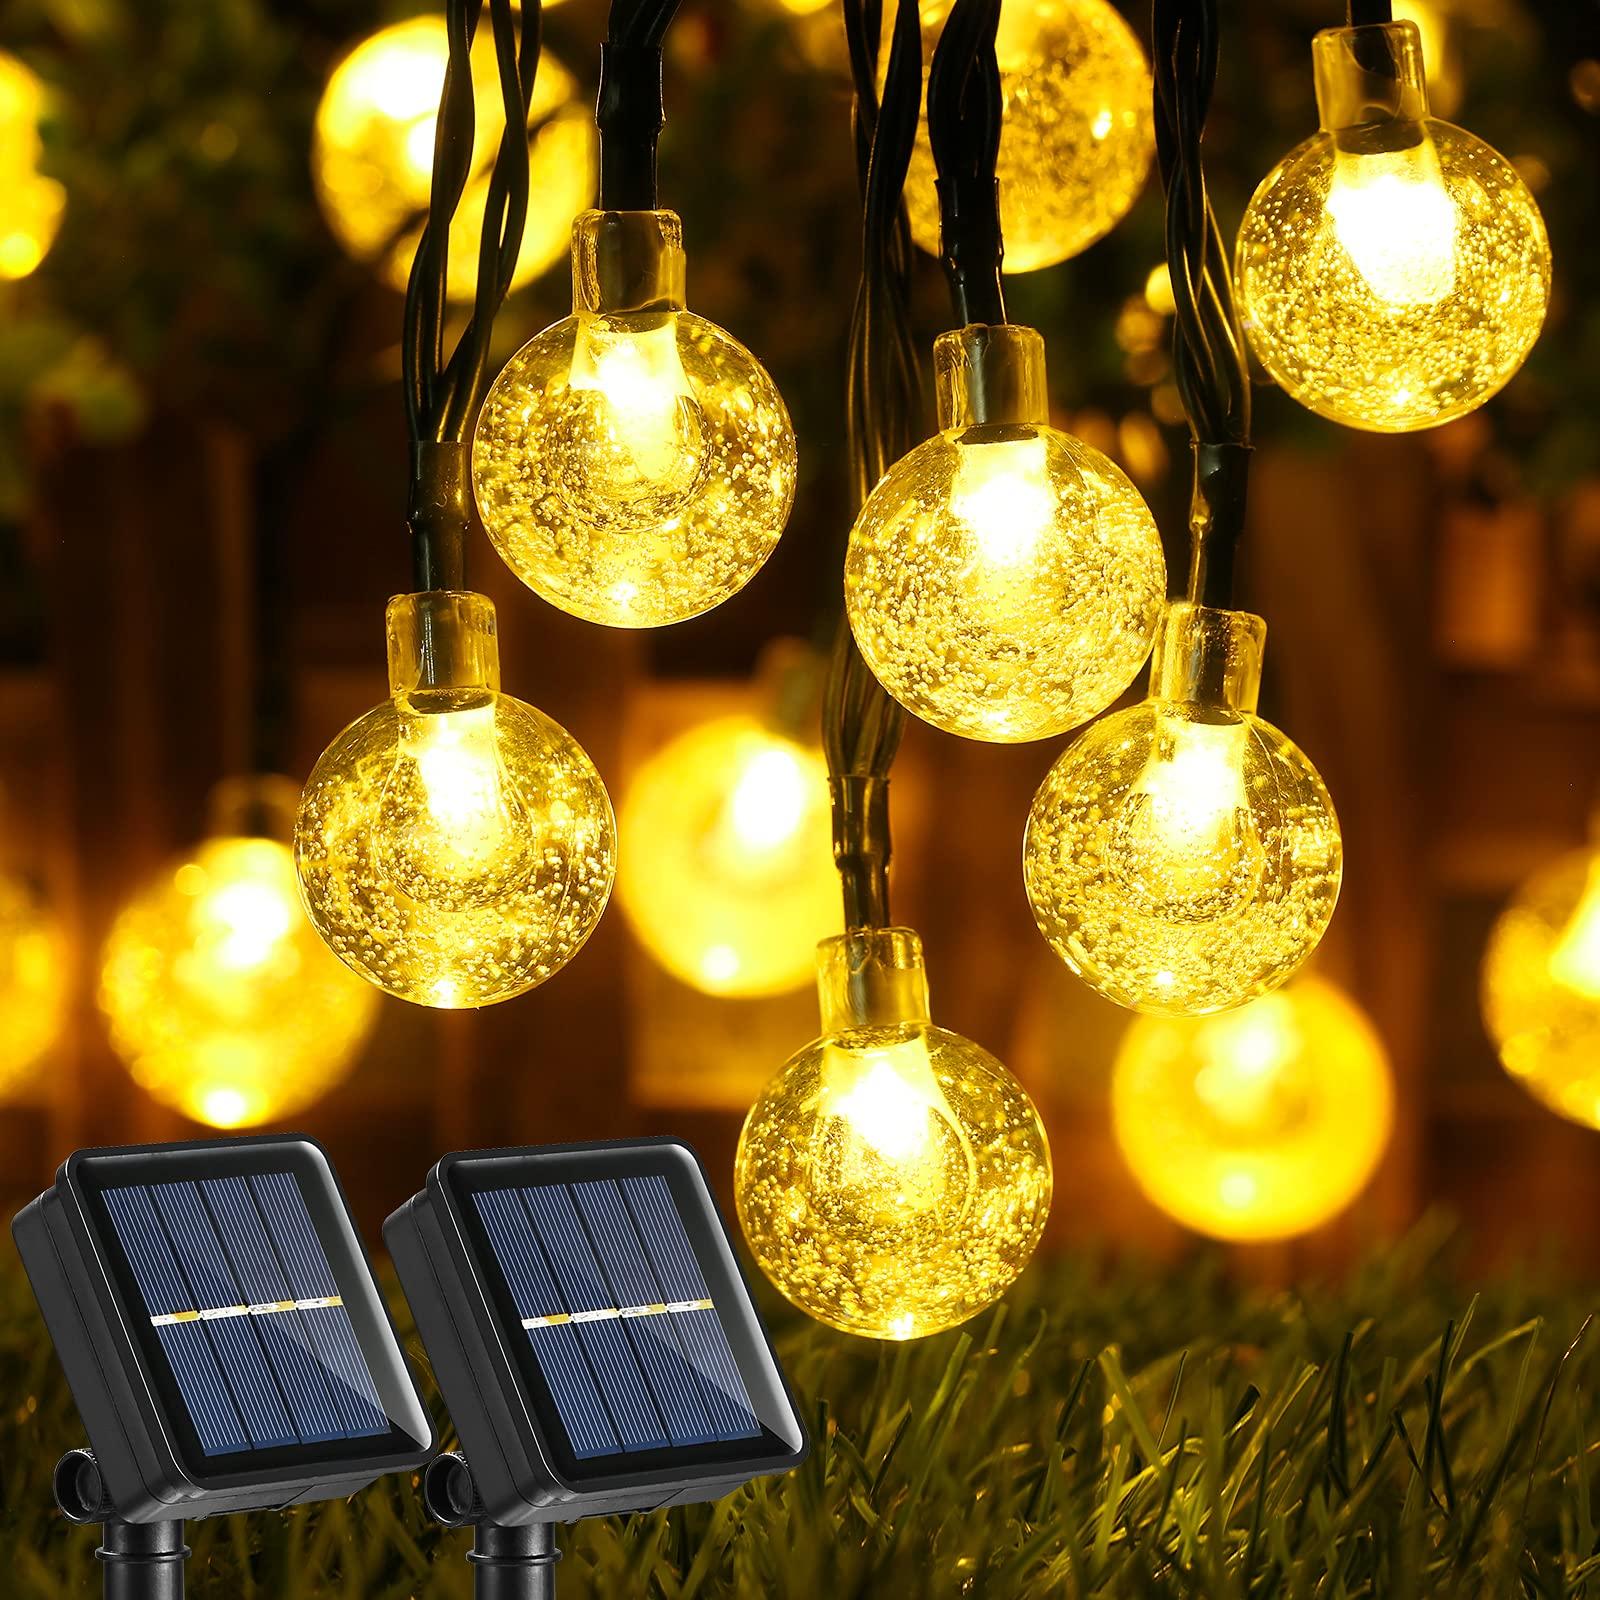 Joomer Solar String Lights OutdoorUpgraded 2 Pack 30 LED 20ft Crystal Globe